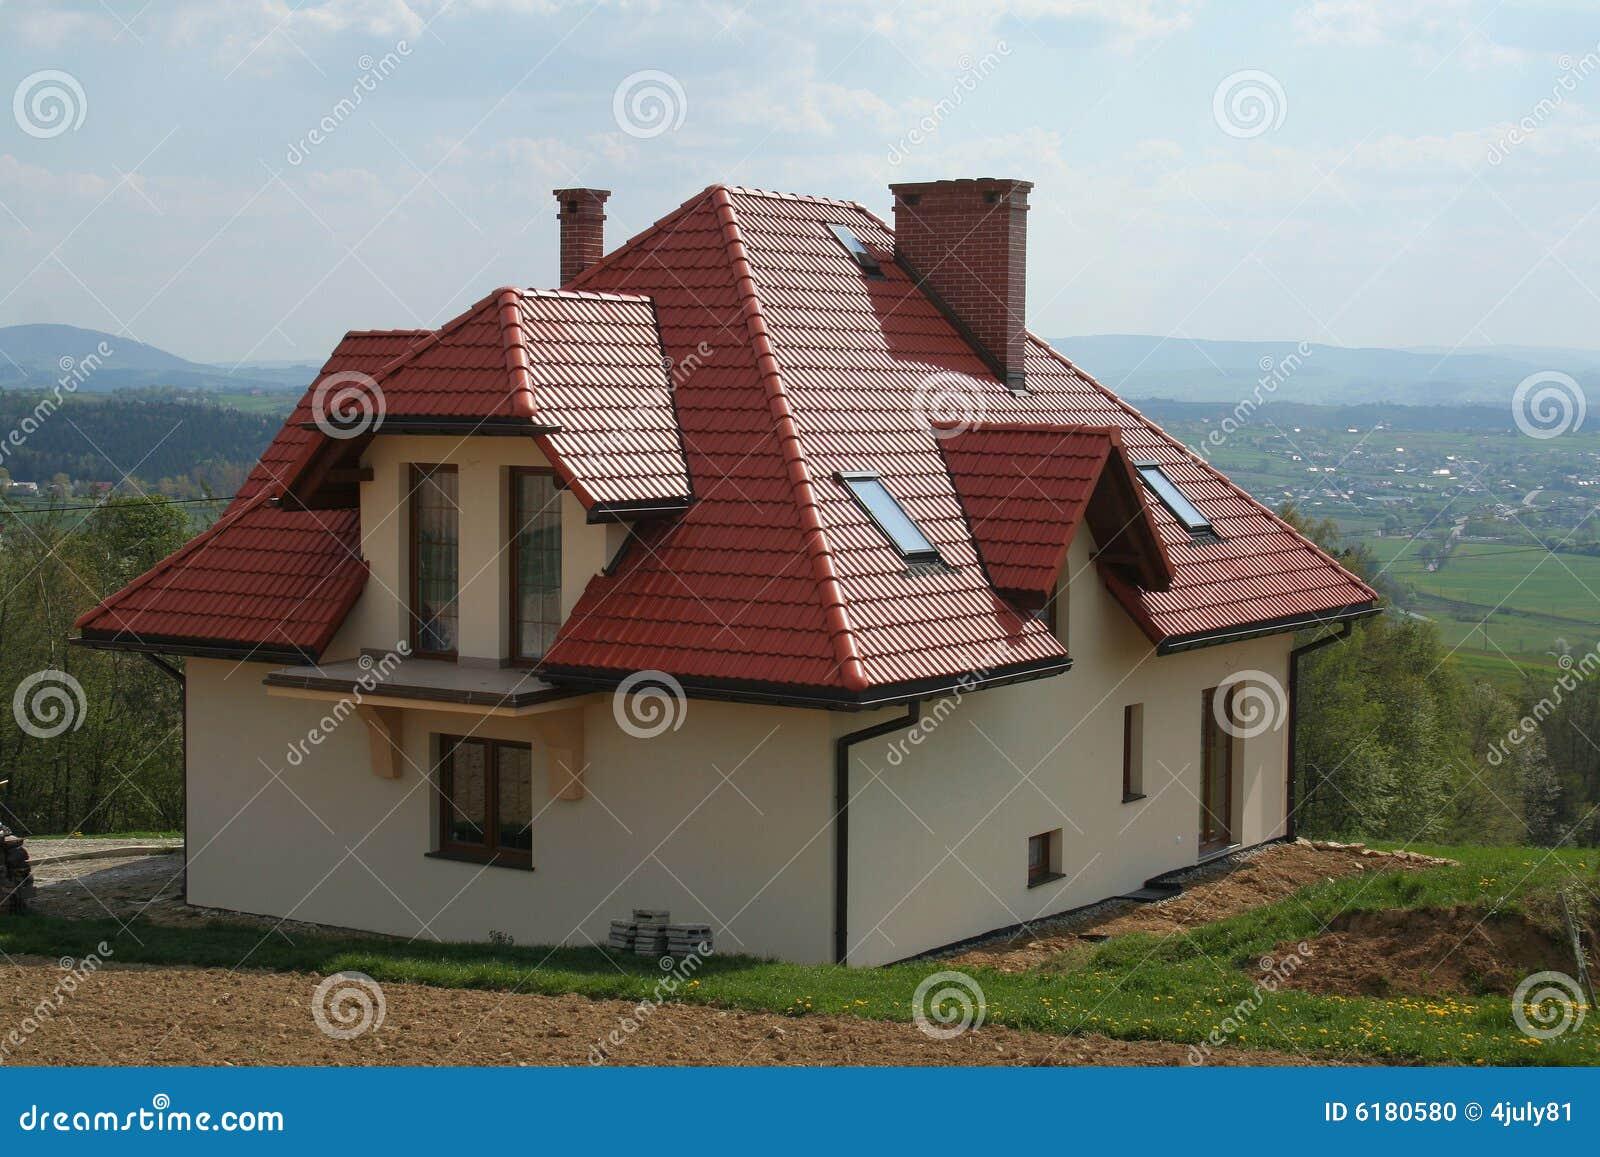 haus mit rotem dach stockfoto bild 6180580. Black Bedroom Furniture Sets. Home Design Ideas